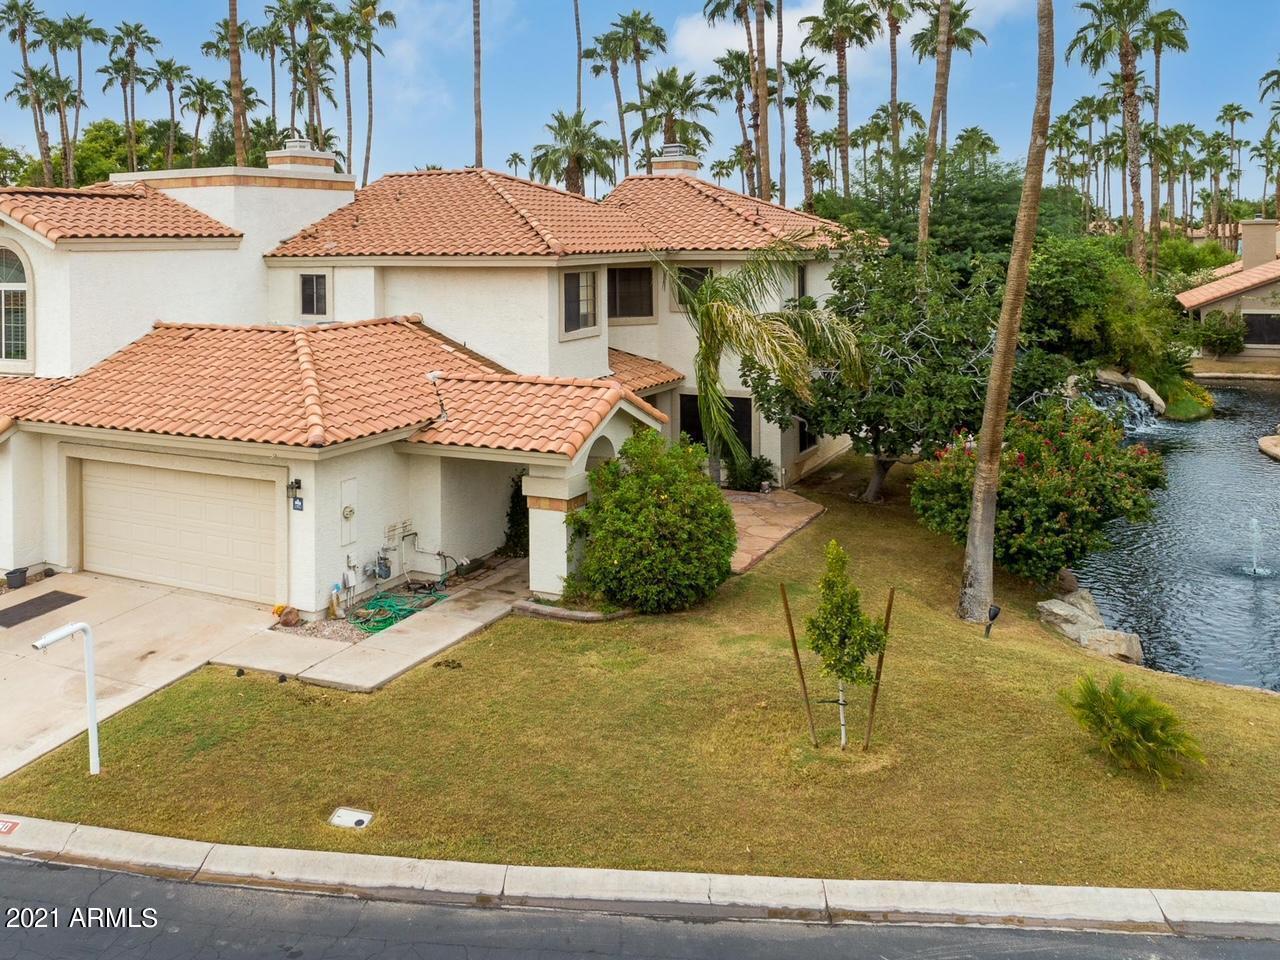 MLS 6301698 1350 W CRYSTAL SPRINGS Drive, Gilbert, AZ 85233 Gated Homes